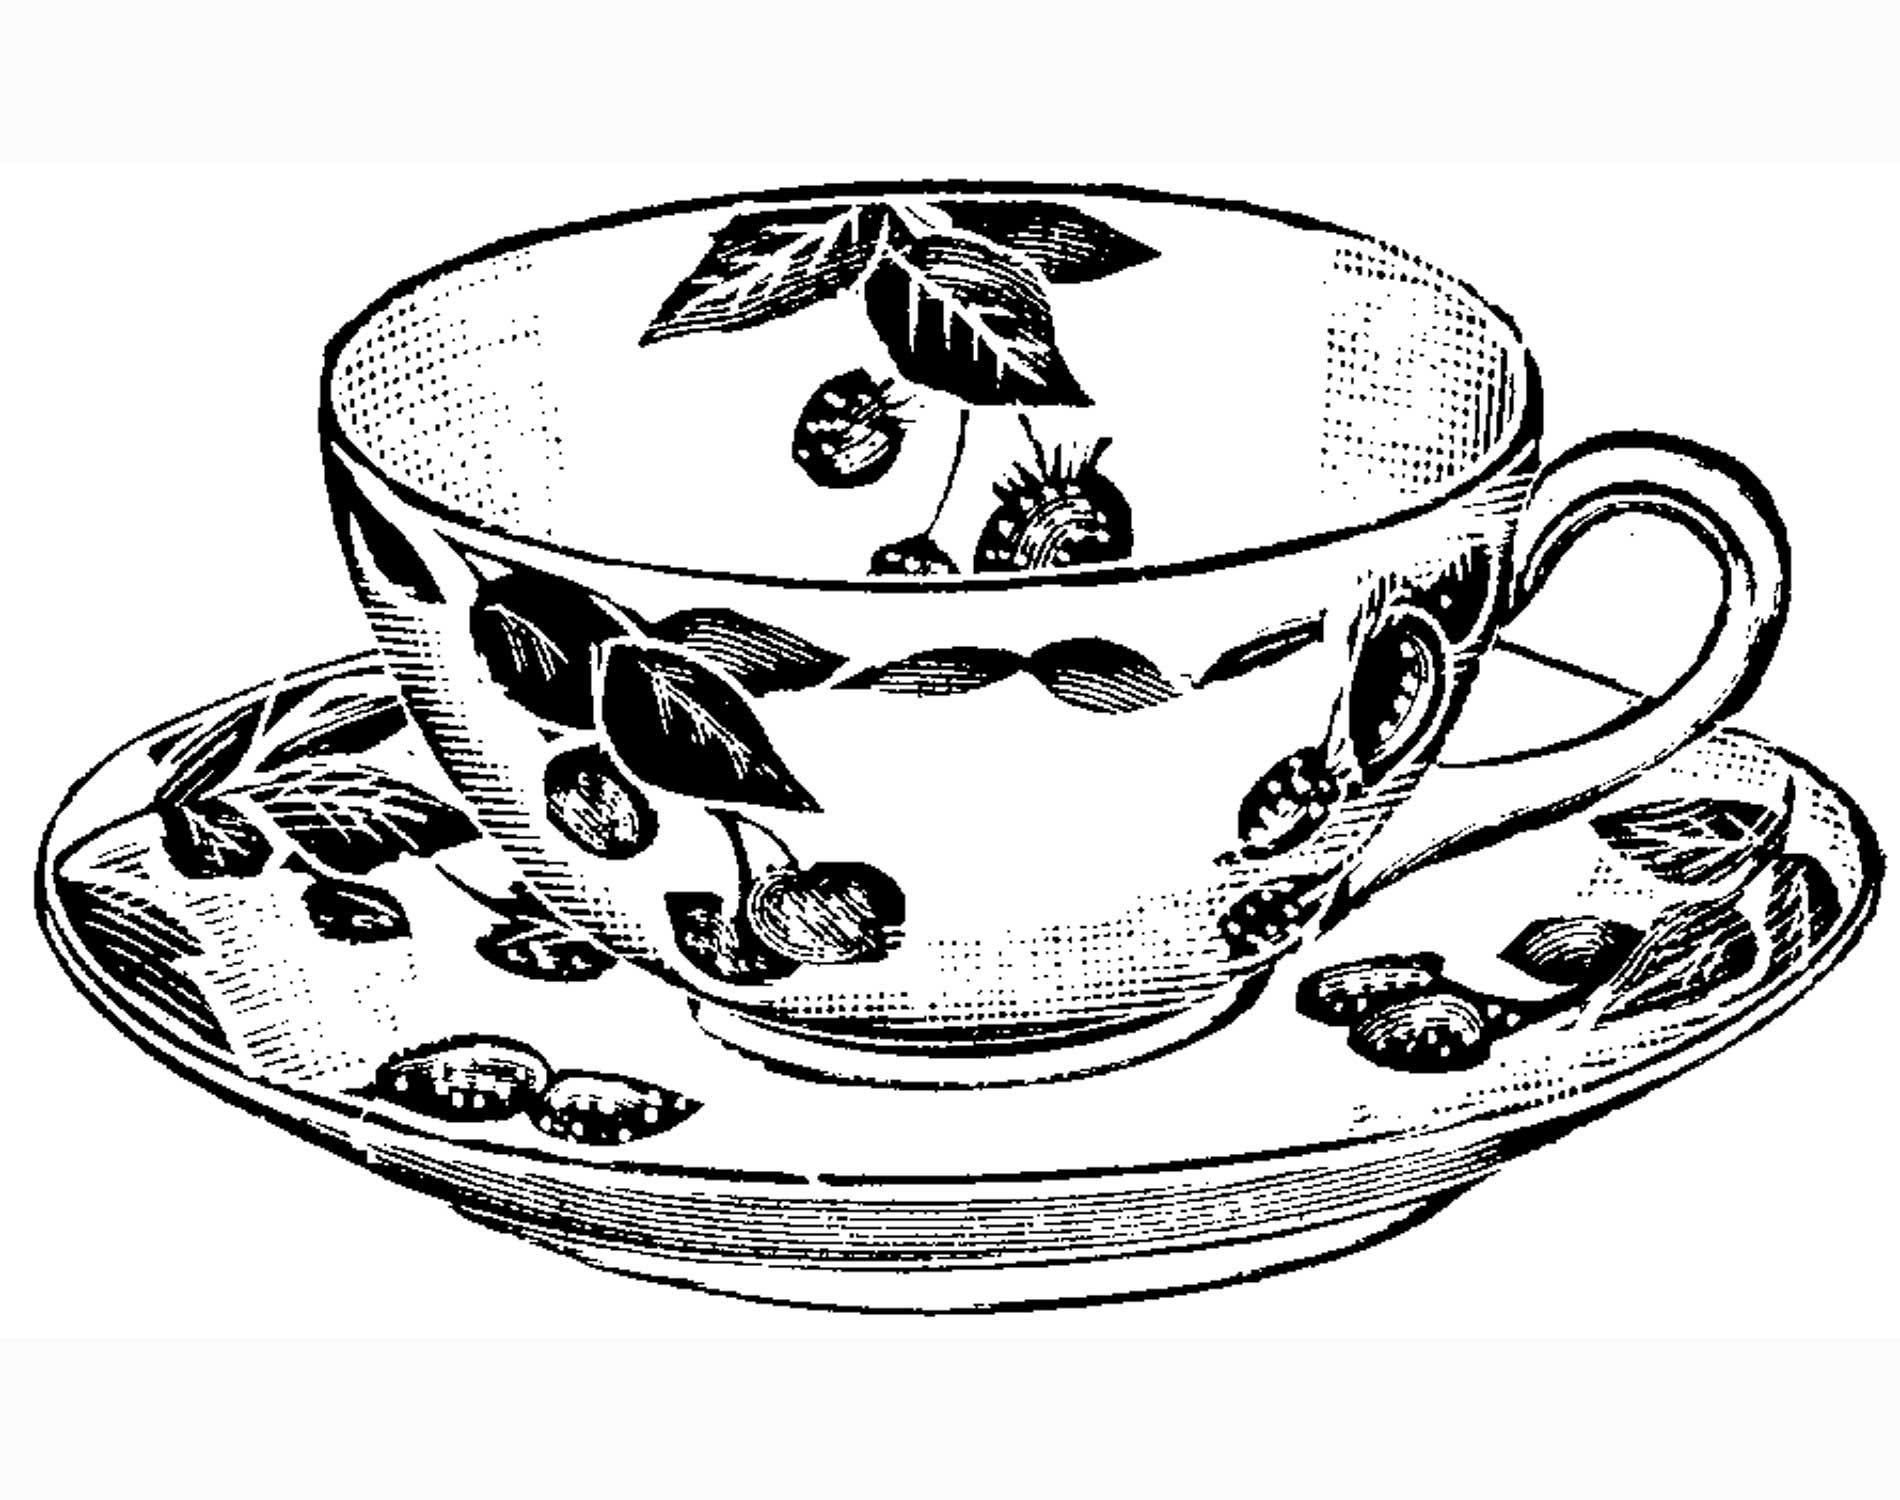 Teacup Print | Craft & Create | Tea Cup Drawing, Tea Cups, Tea - Free Printable Tea Cup Coloring Pages